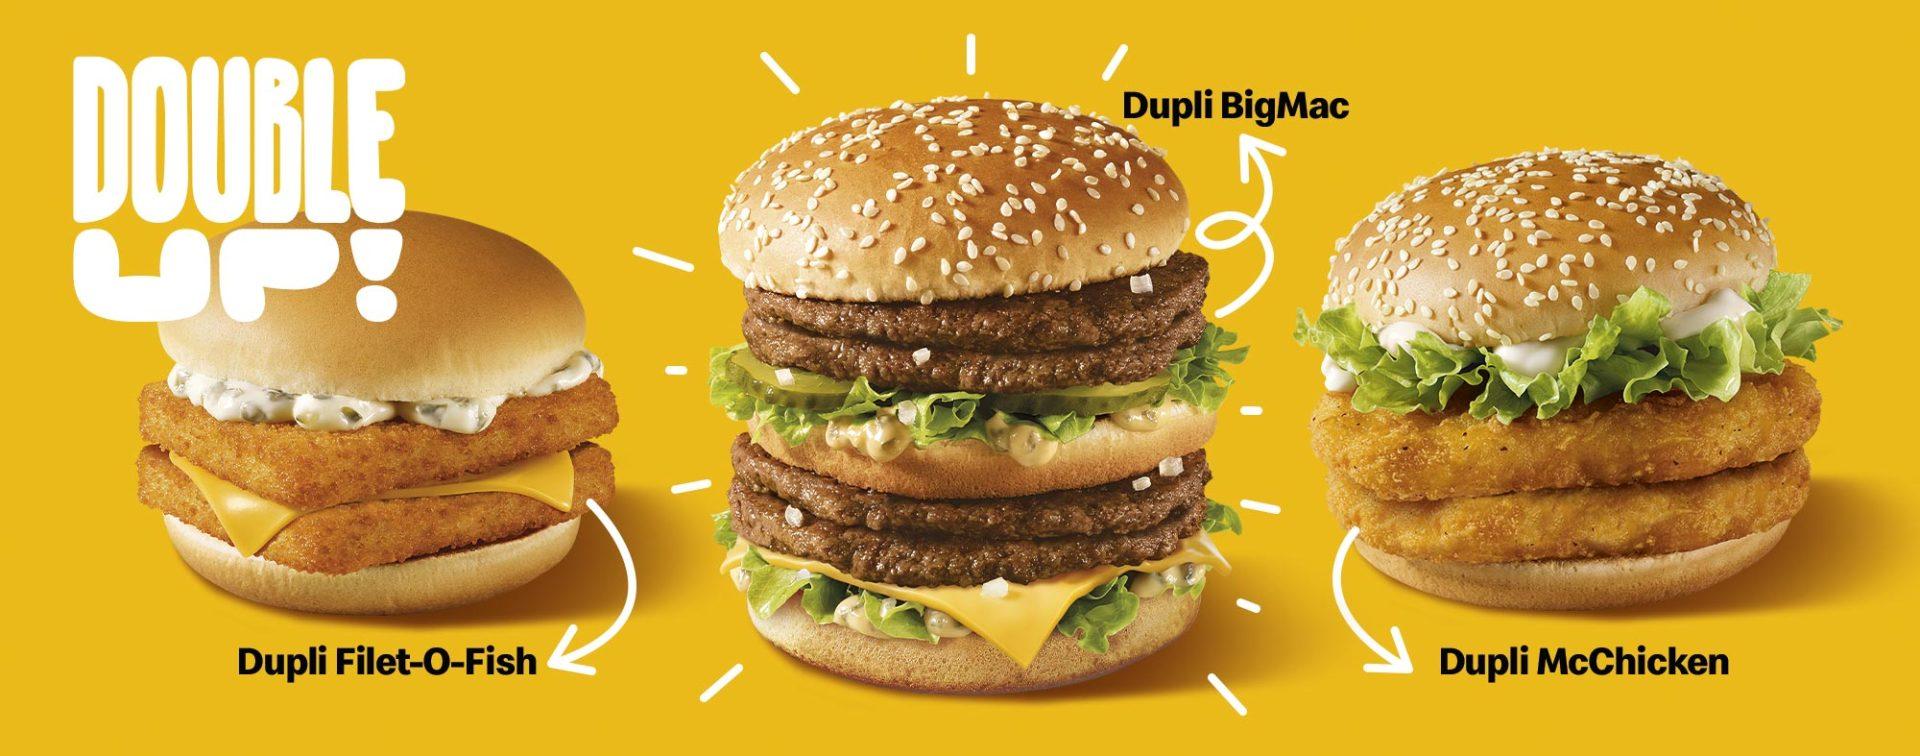 Slajder--Double-burgeri_2000x787px